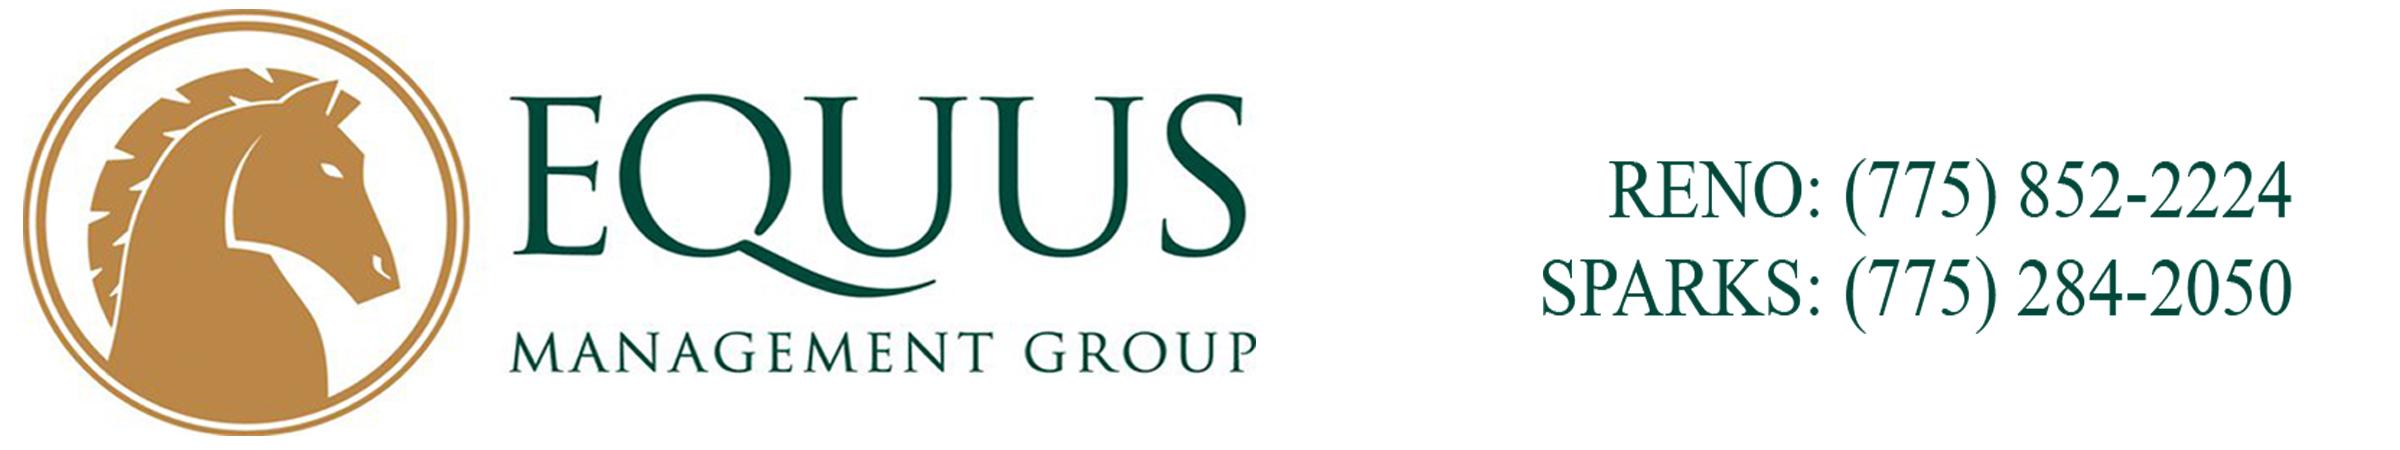 Equus Mangement Groups Credentialed Community Managers In Reno Nevada